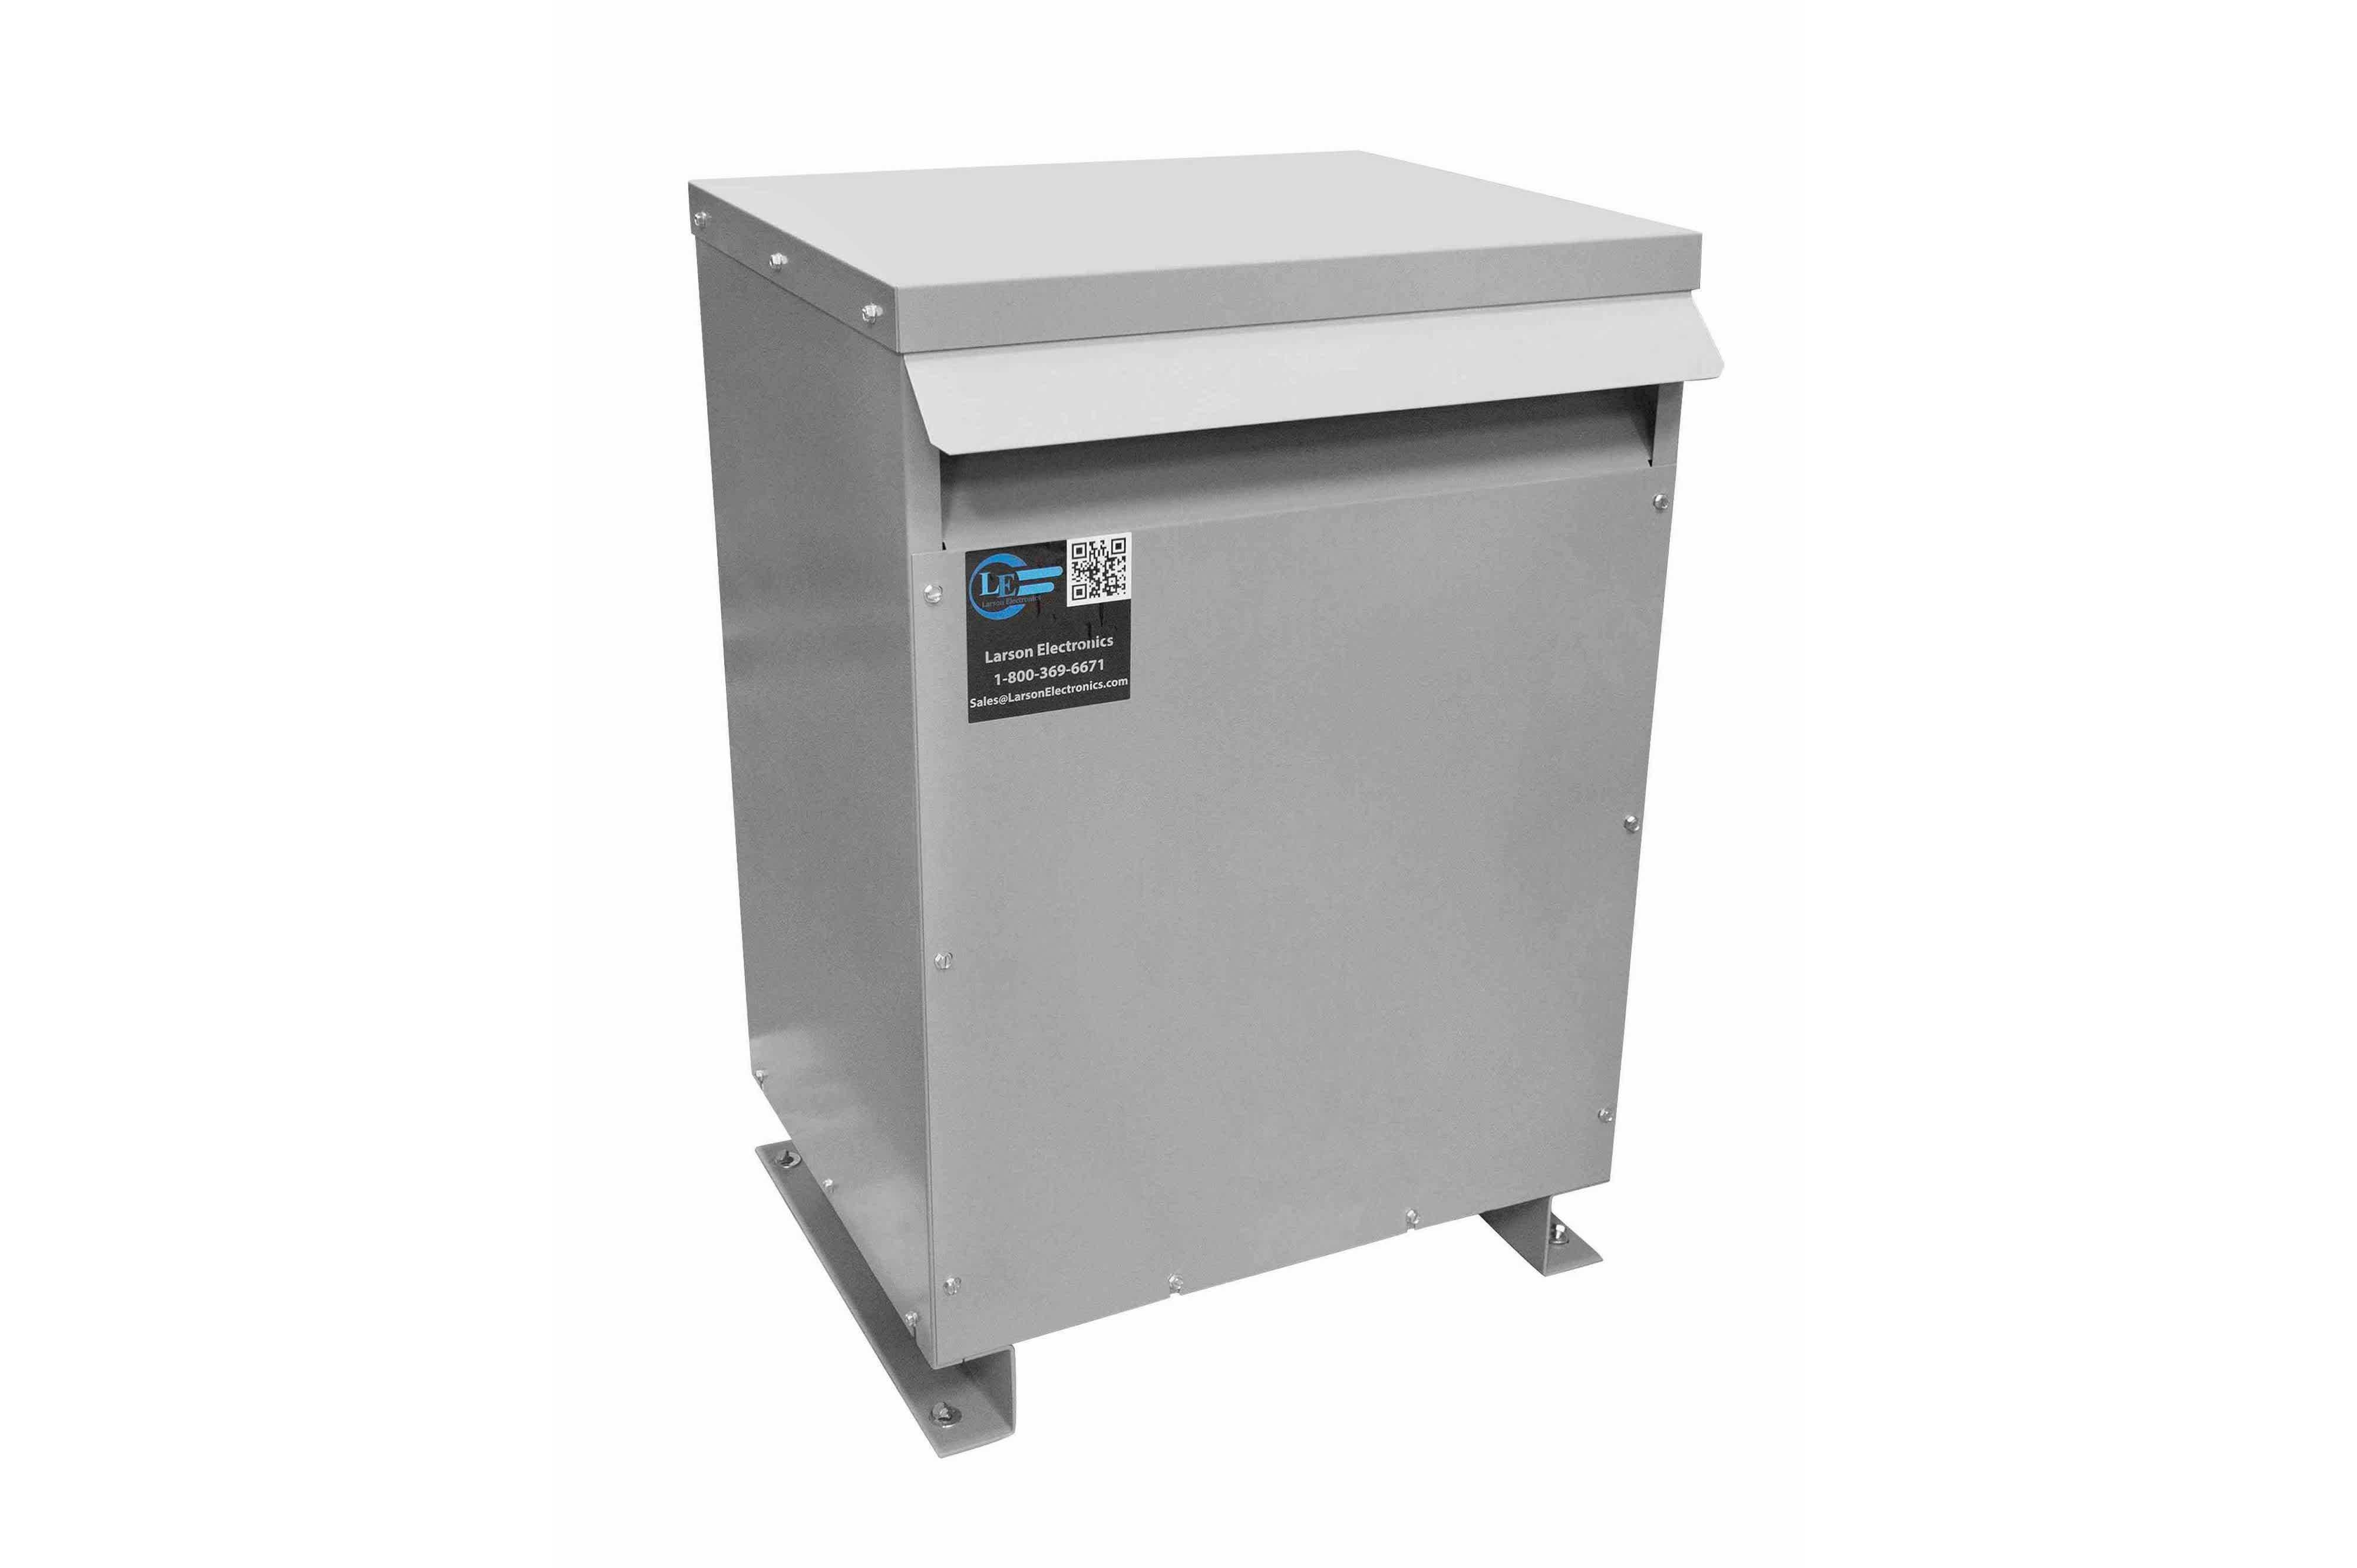 20 kVA 3PH Isolation Transformer, 208V Wye Primary, 415Y/240 Wye-N Secondary, N3R, Ventilated, 60 Hz